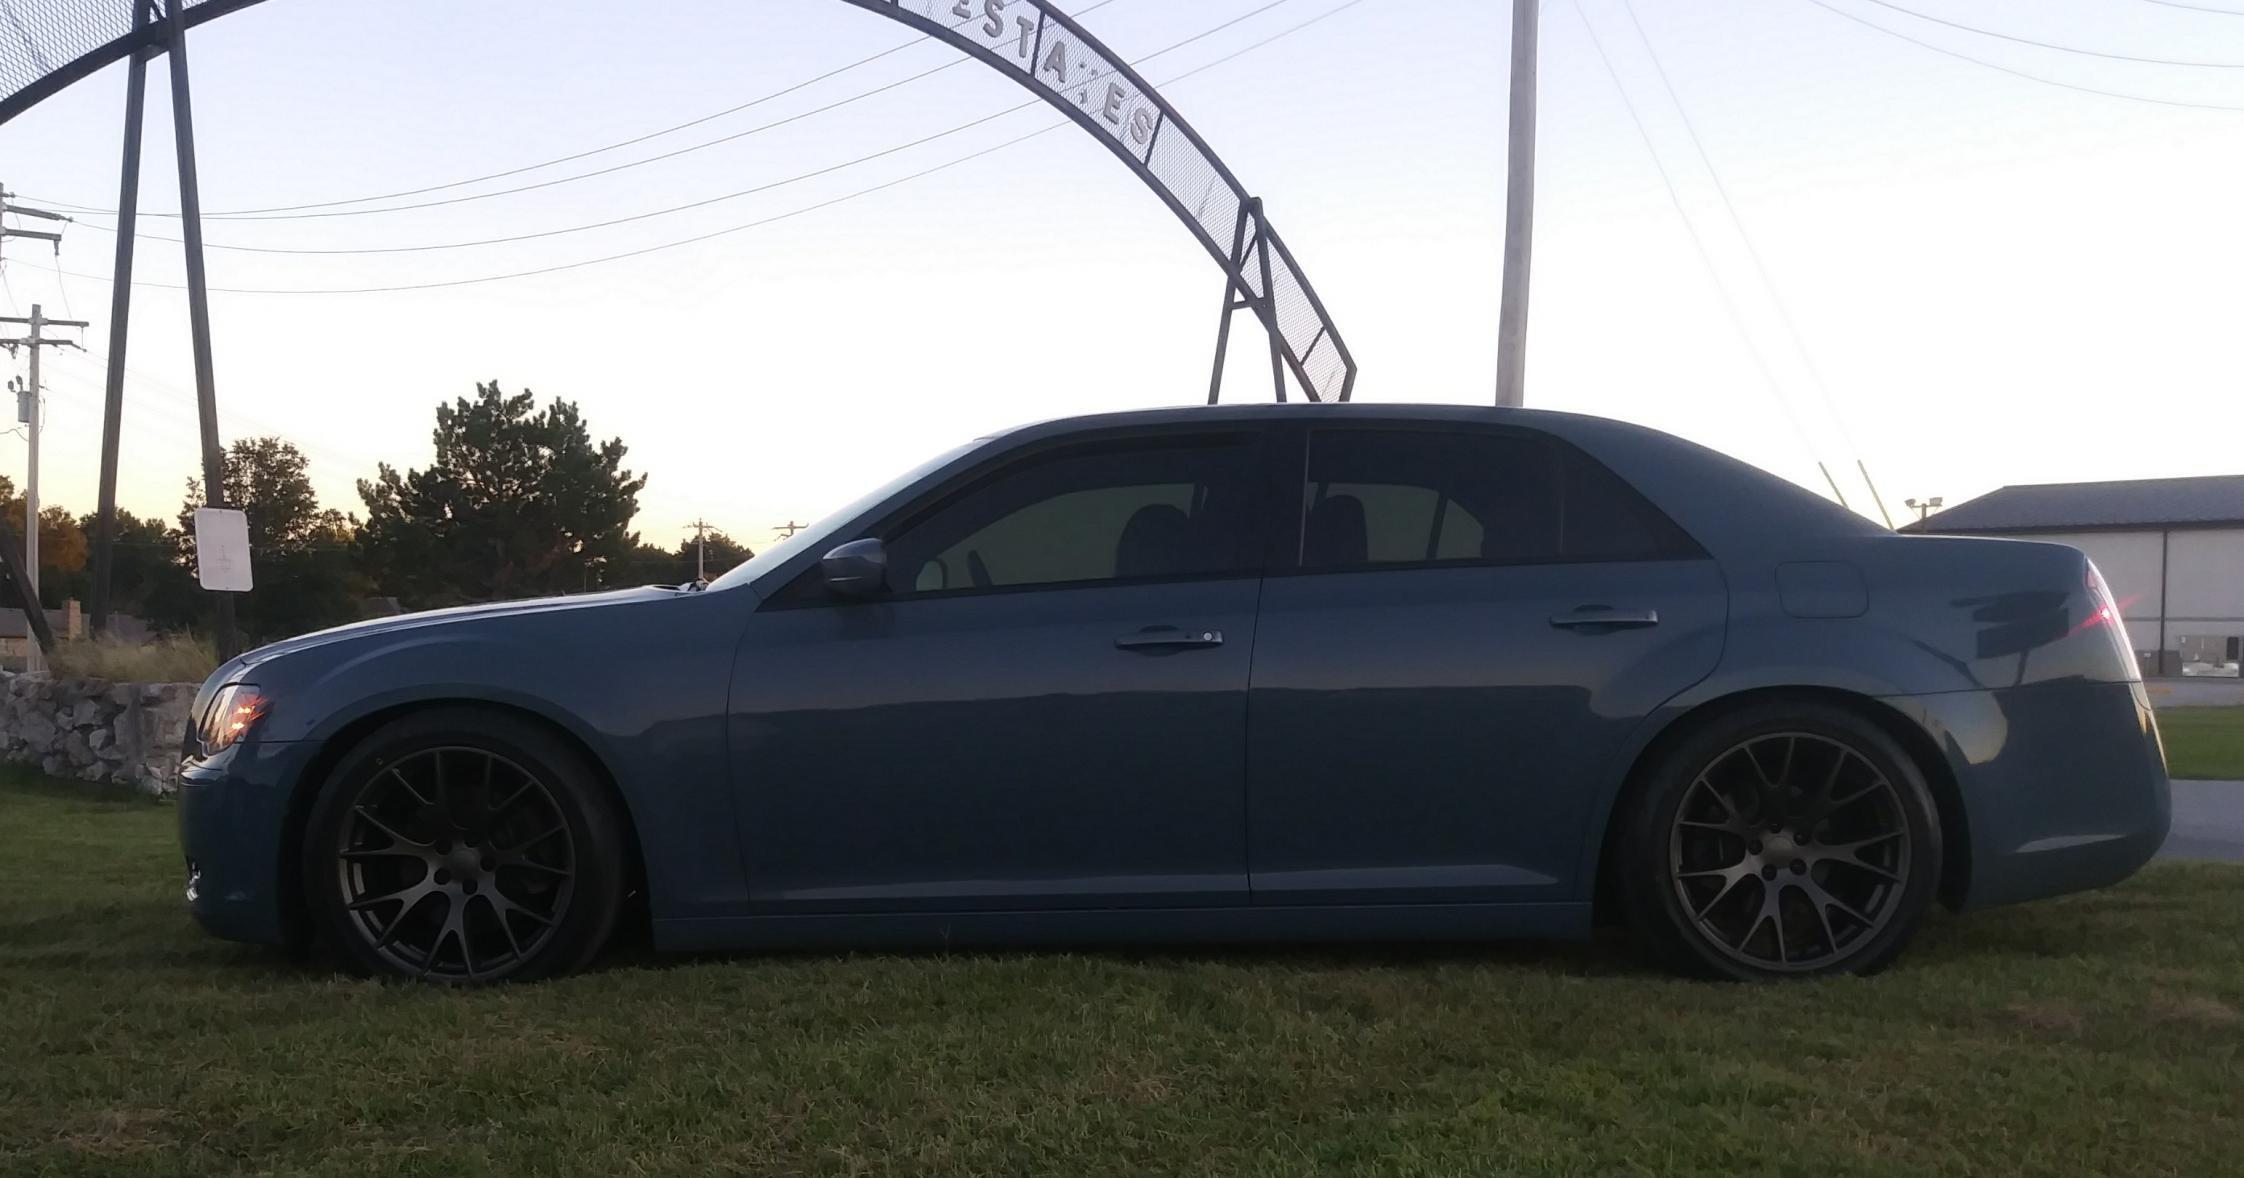 hellcat replica wheels installed! - Chrysler 300C Forum ...